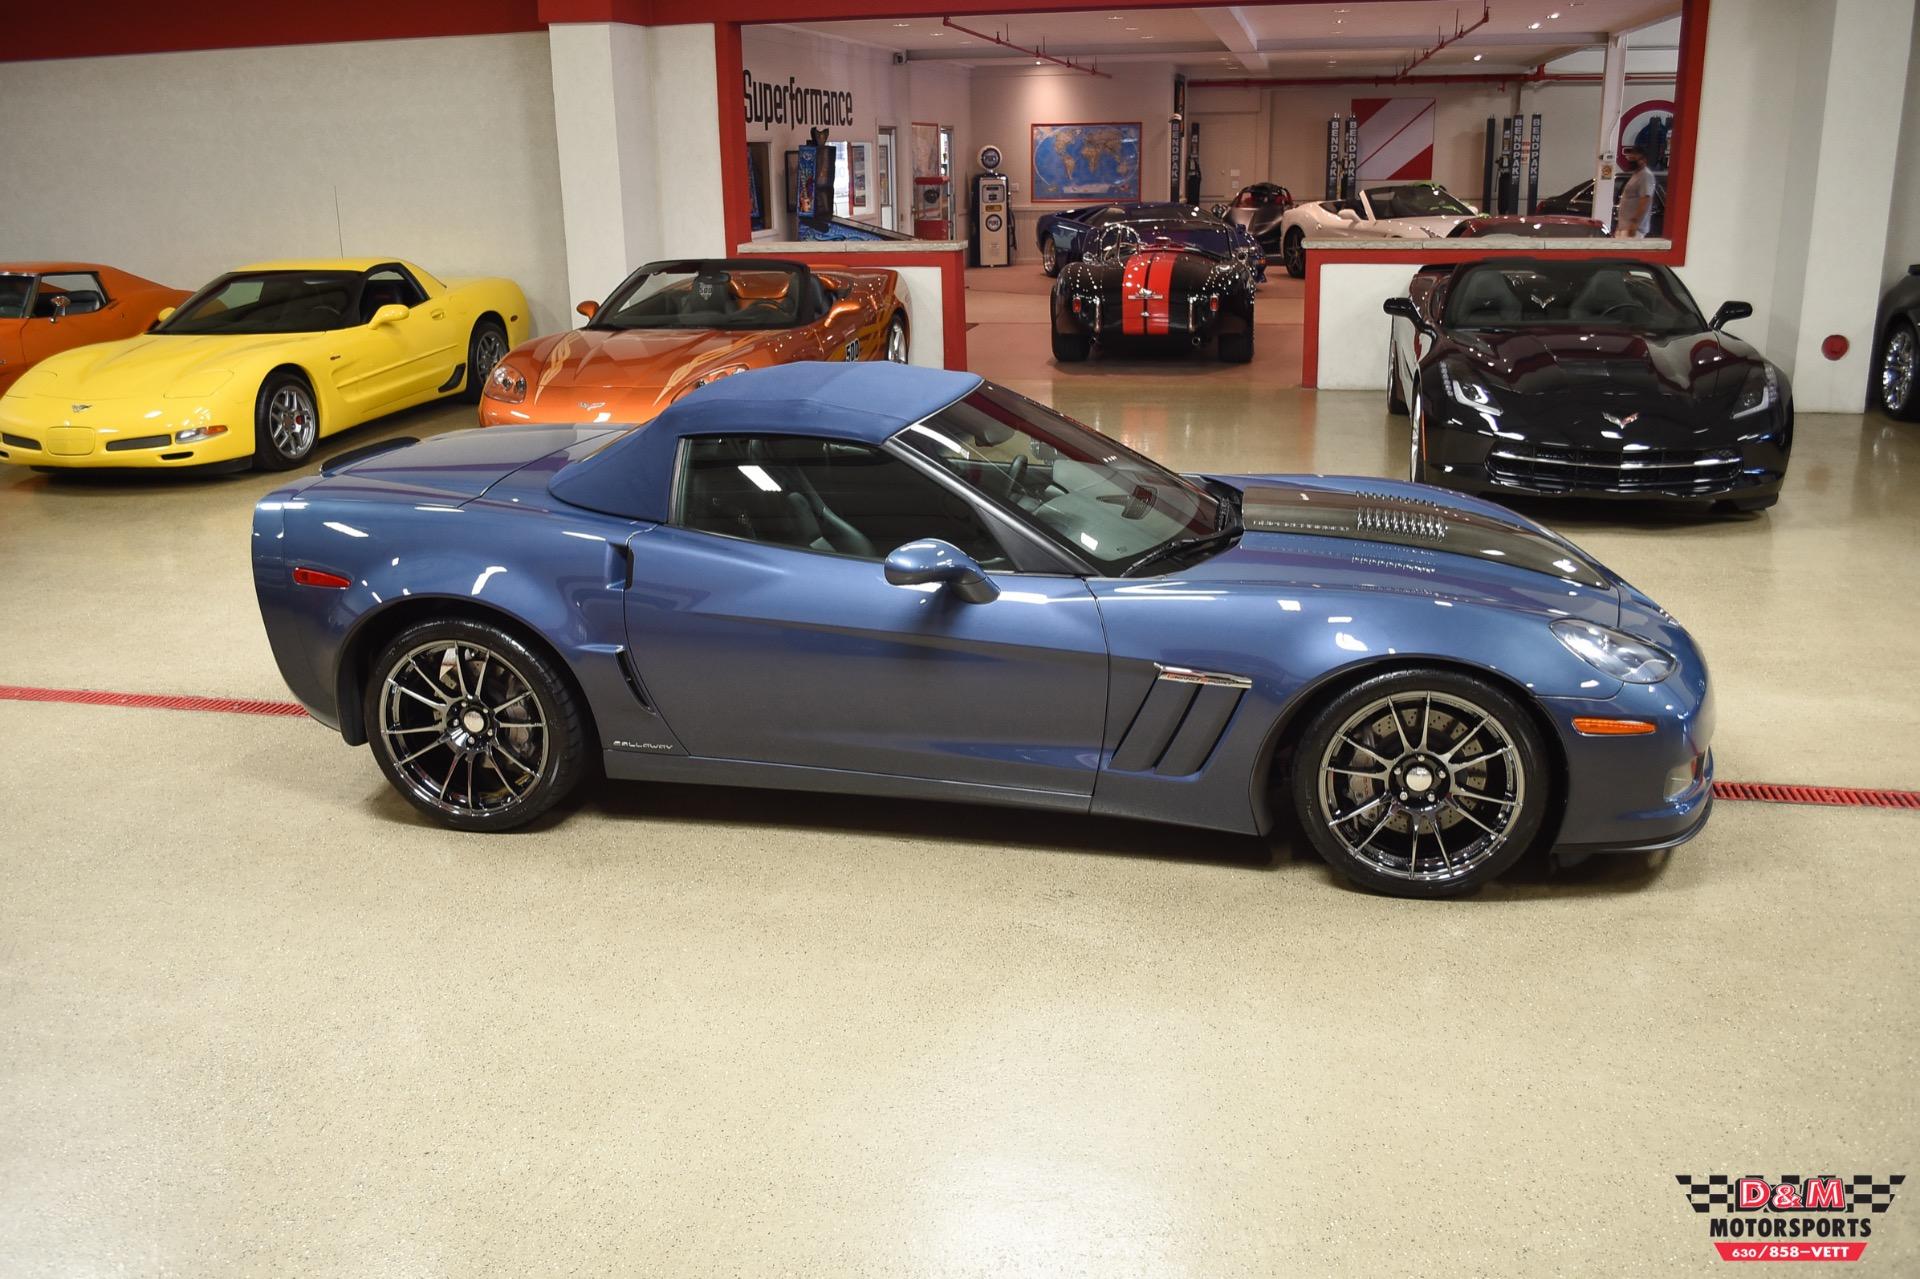 Used 2011 Chevrolet Corvette Grand Sport Callaway Convertible | Glen Ellyn, IL